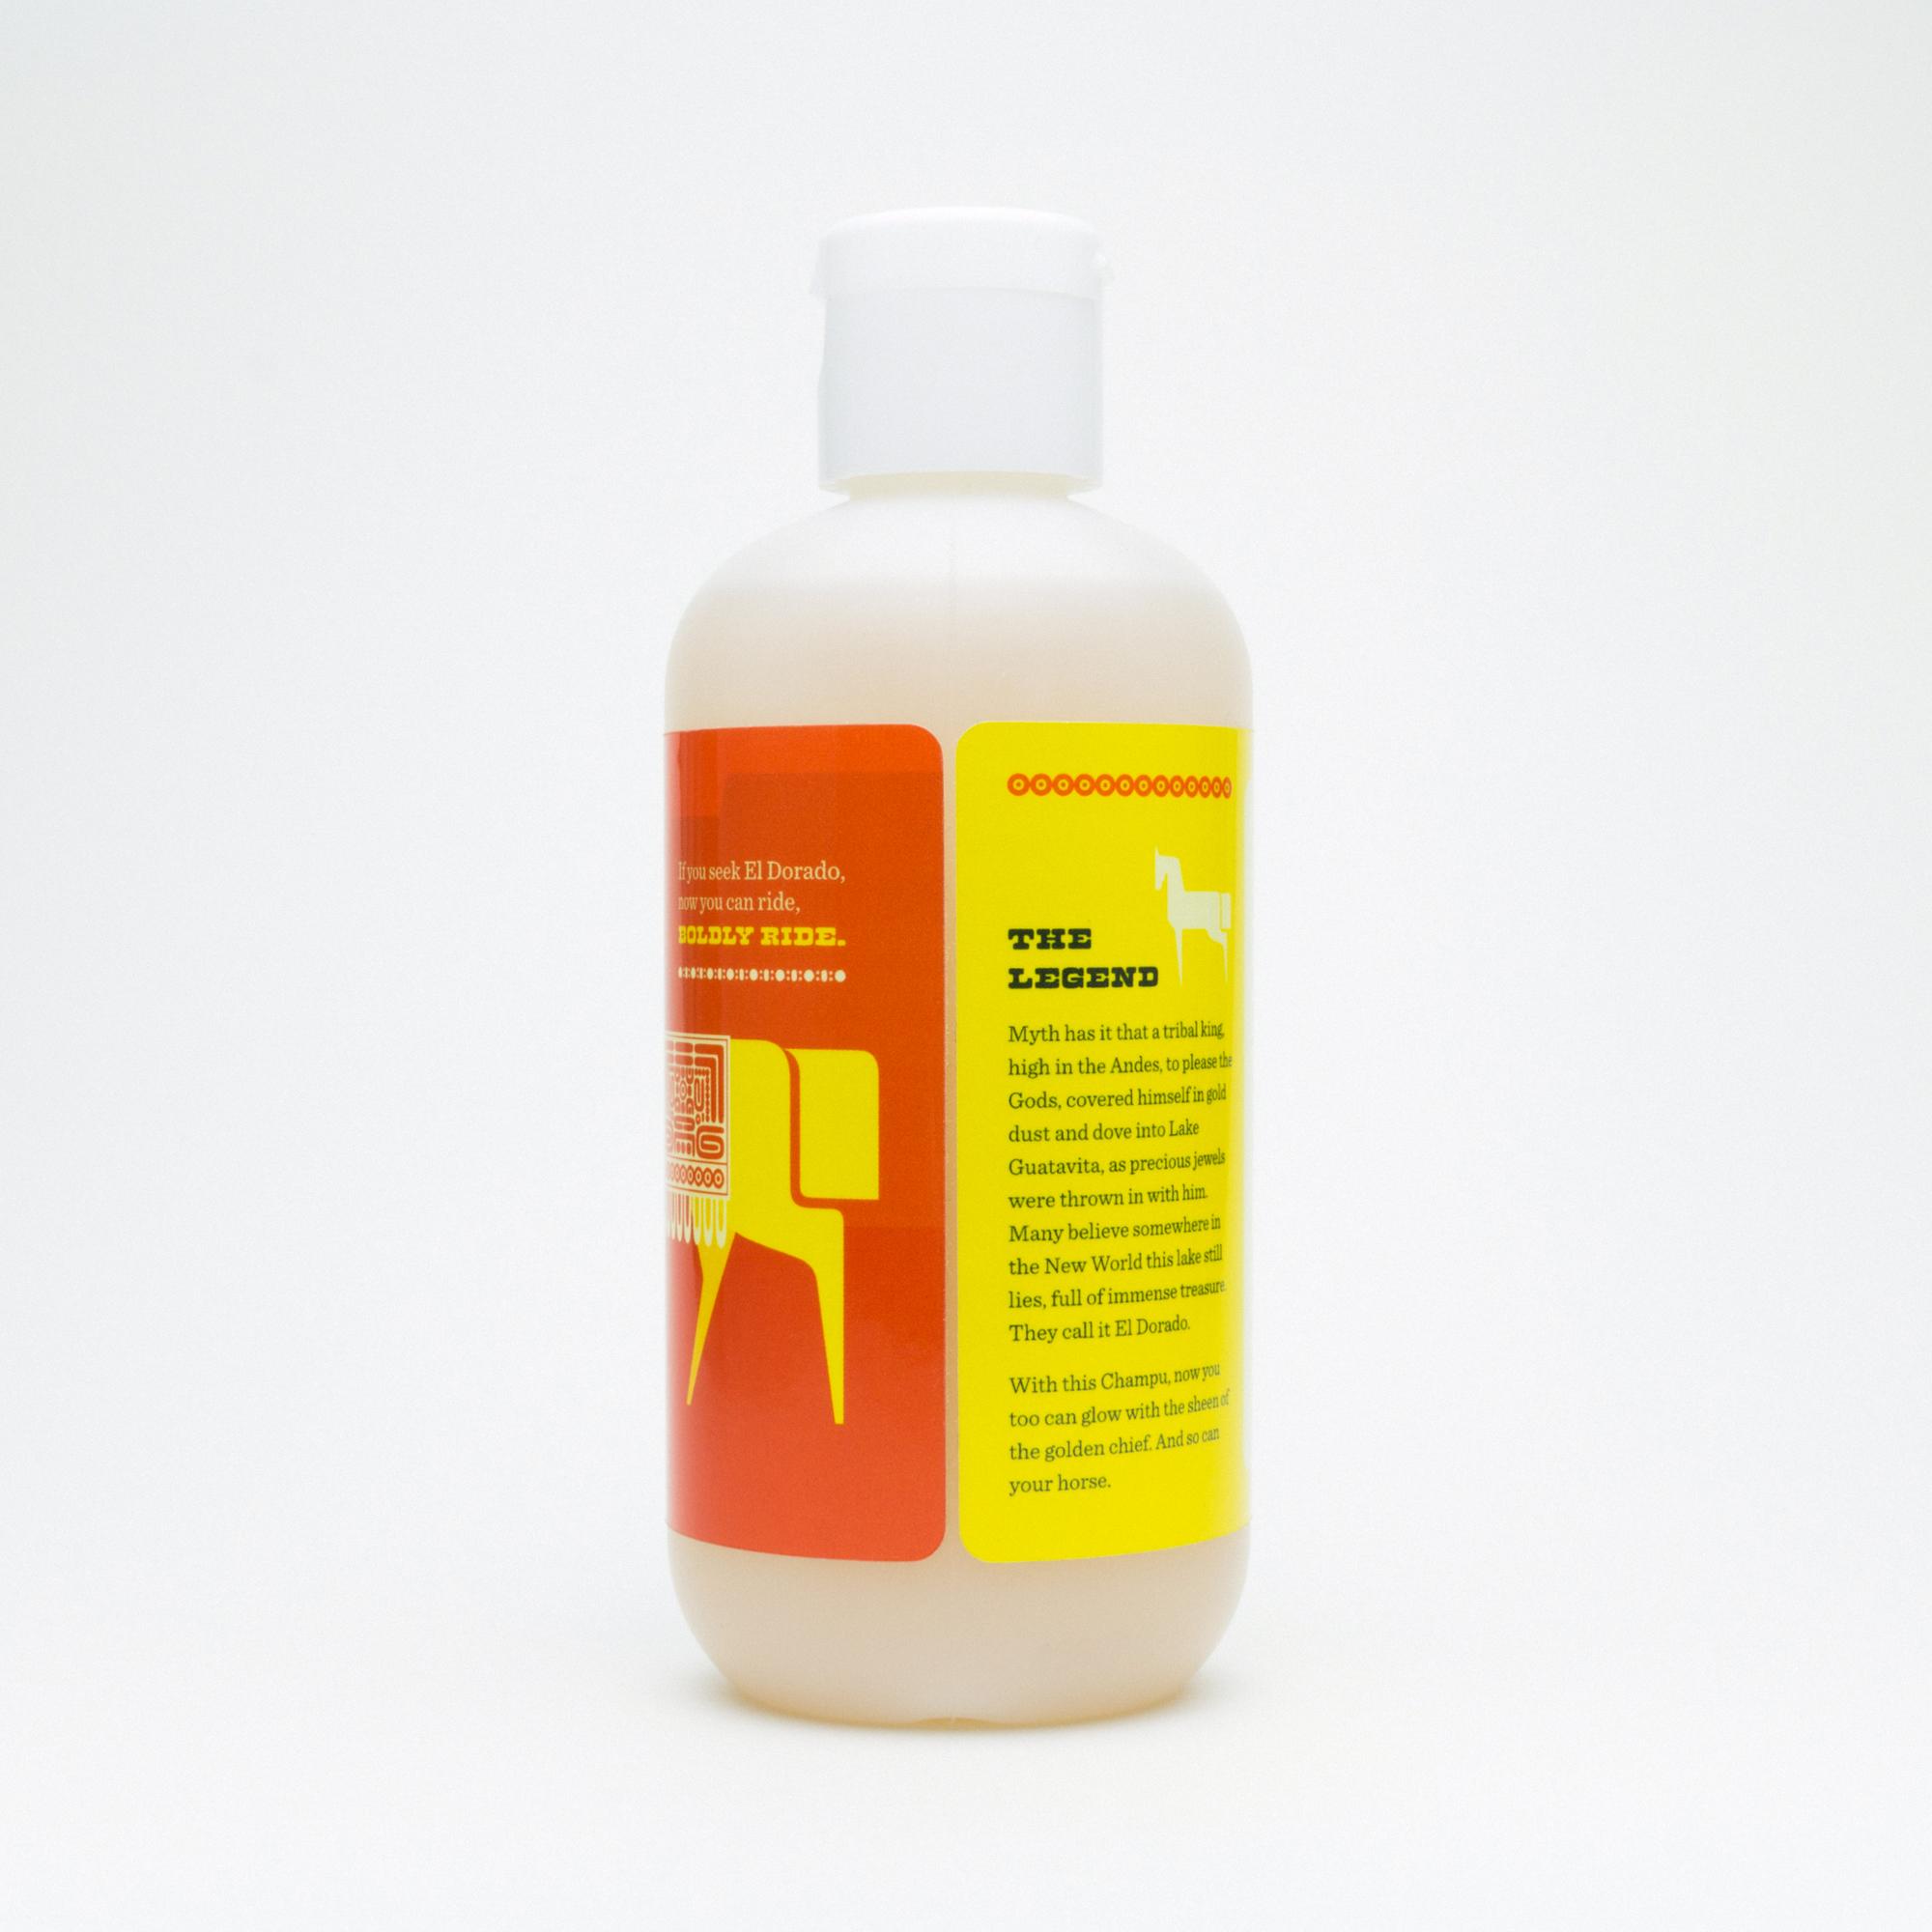 Shampoo_002.jpg